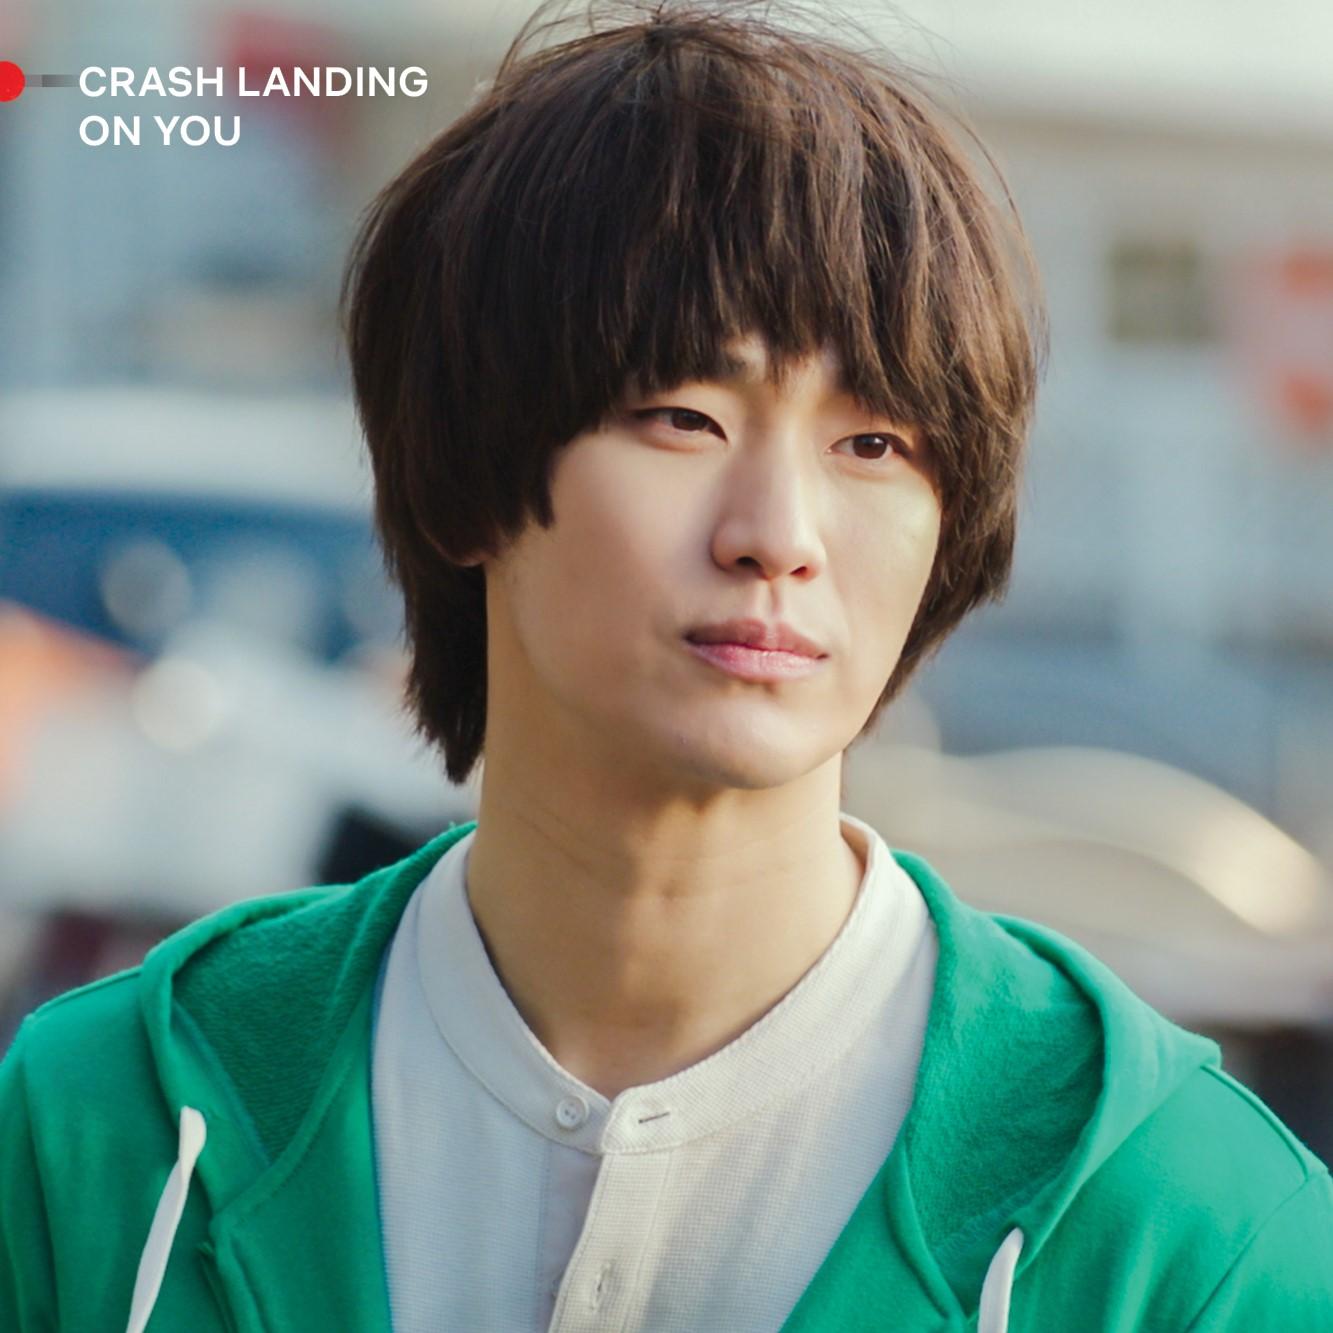 Kim Soo Hyun's iconic cameo in Crash Landing On You'